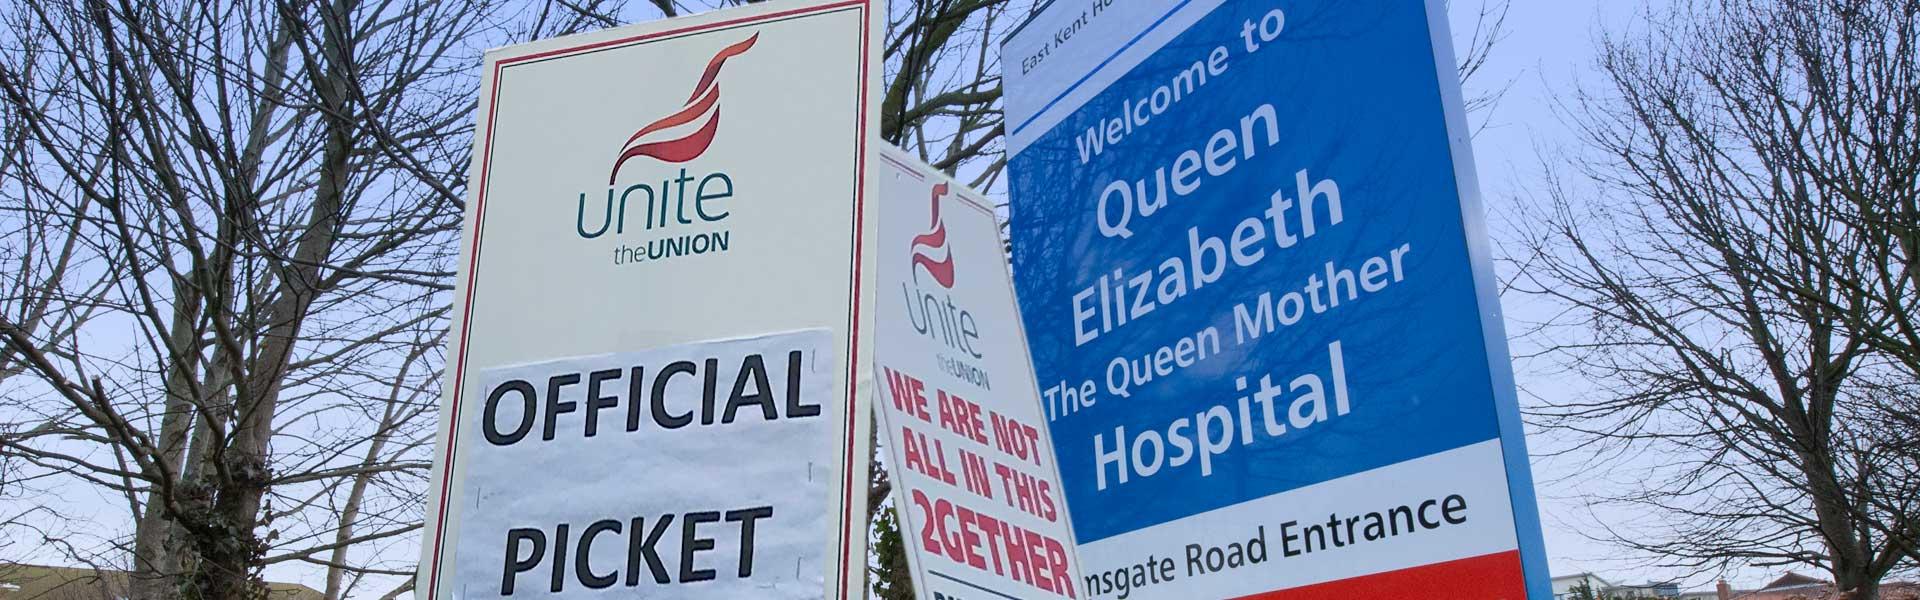 NHS staff strike at QEQM hospital Margate